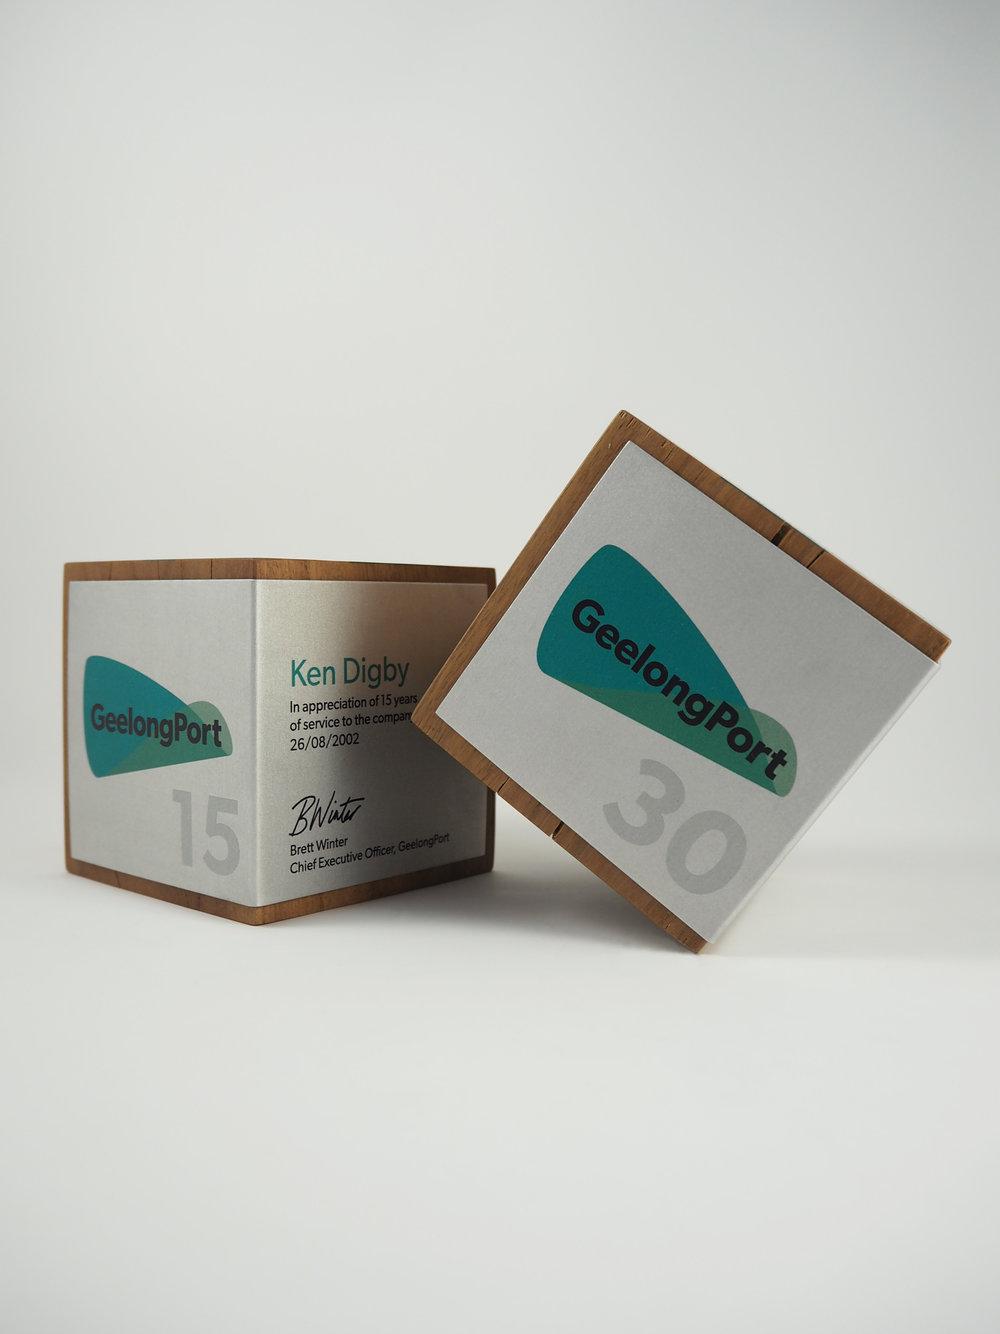 geelong-port-awards-reclaimed-timber-eco-aluminium-trophy-02.jpg